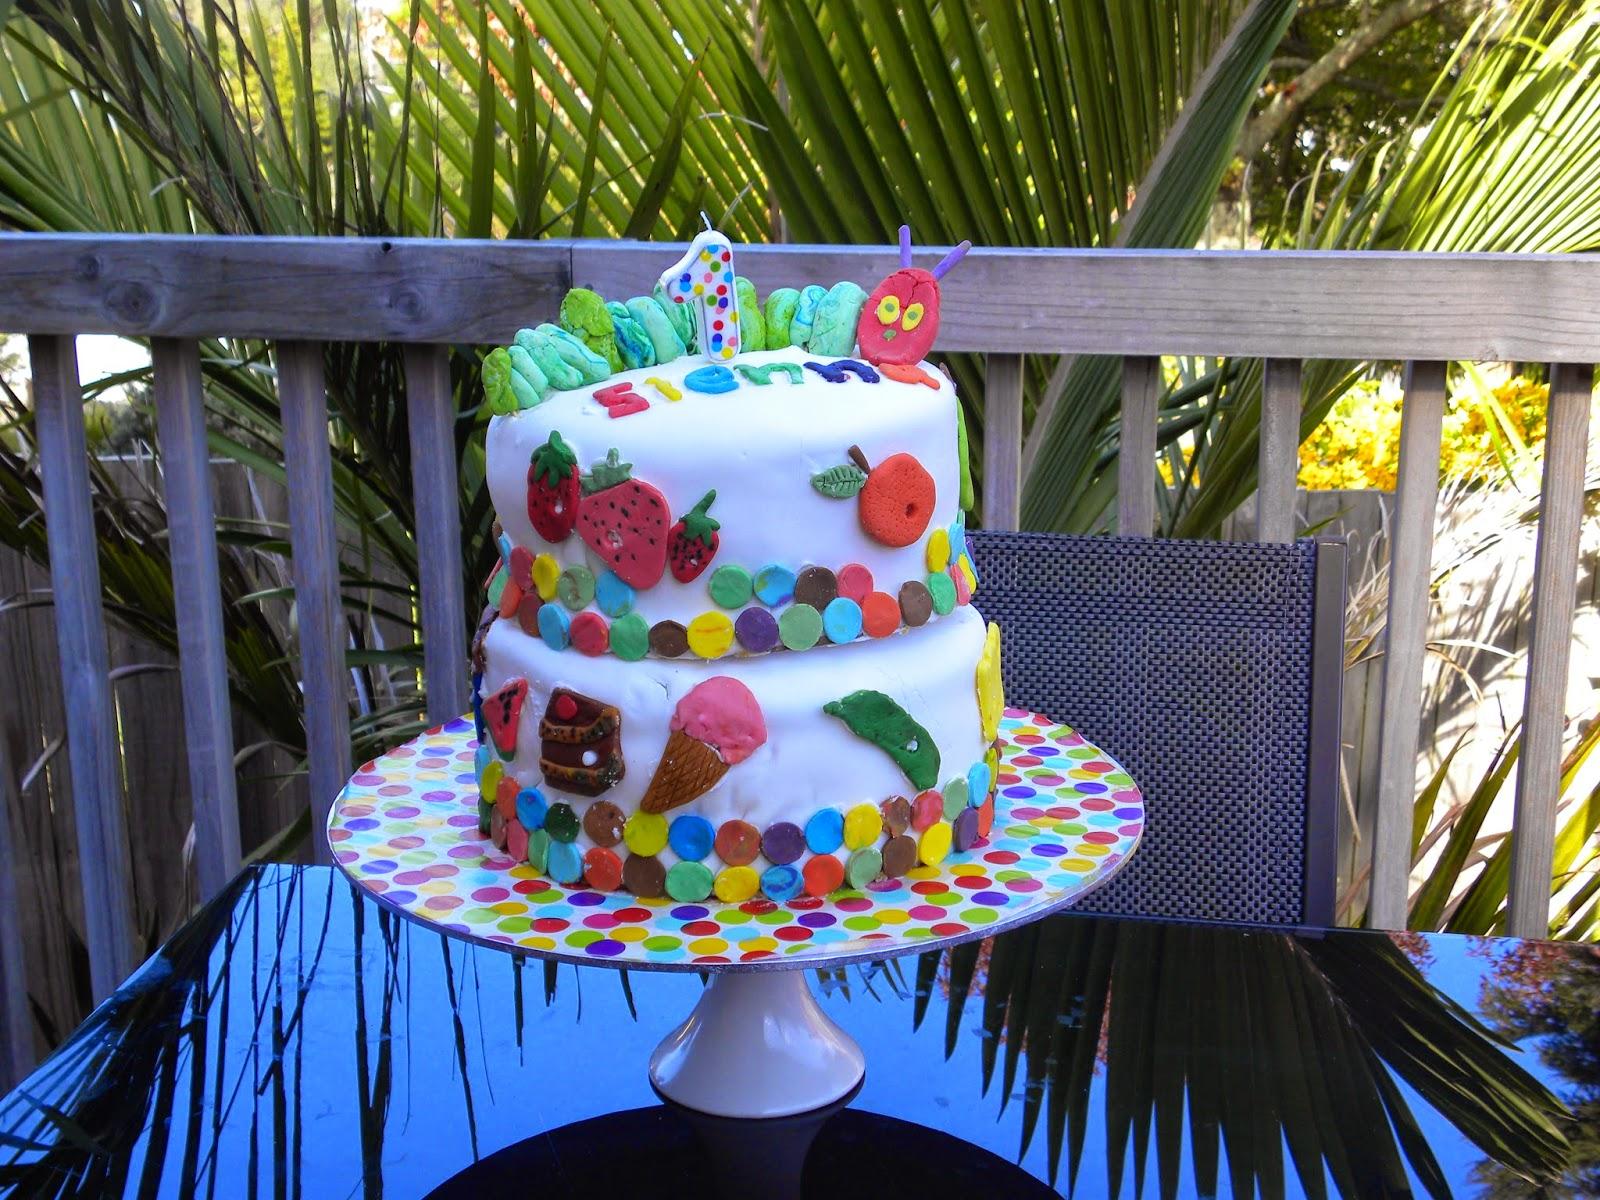 Ammis Kitchen The Very Hungry Caterpillar Birthday Cake